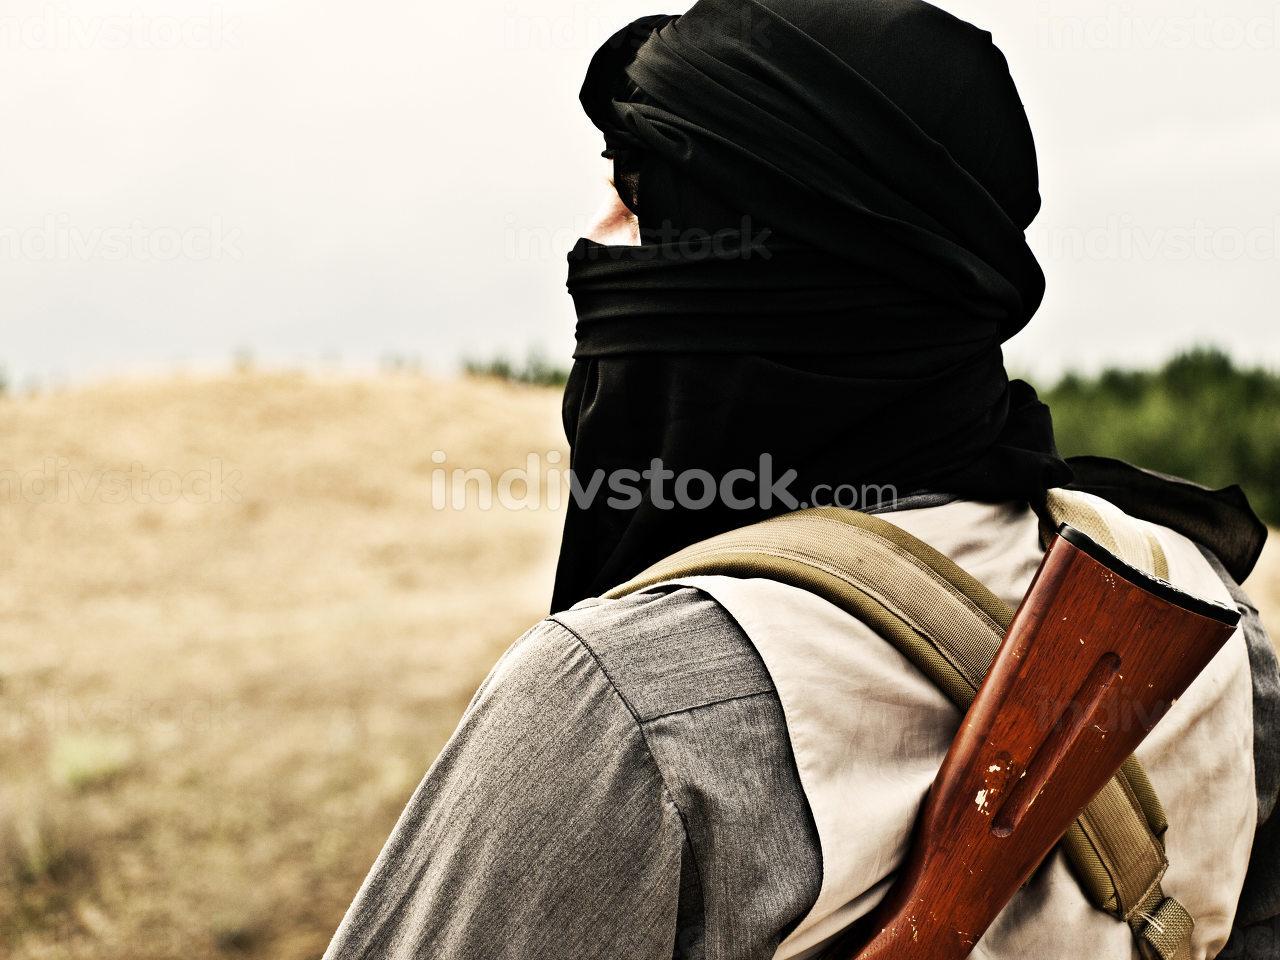 Muslim rebel with automatic rifle and machine-gun belt